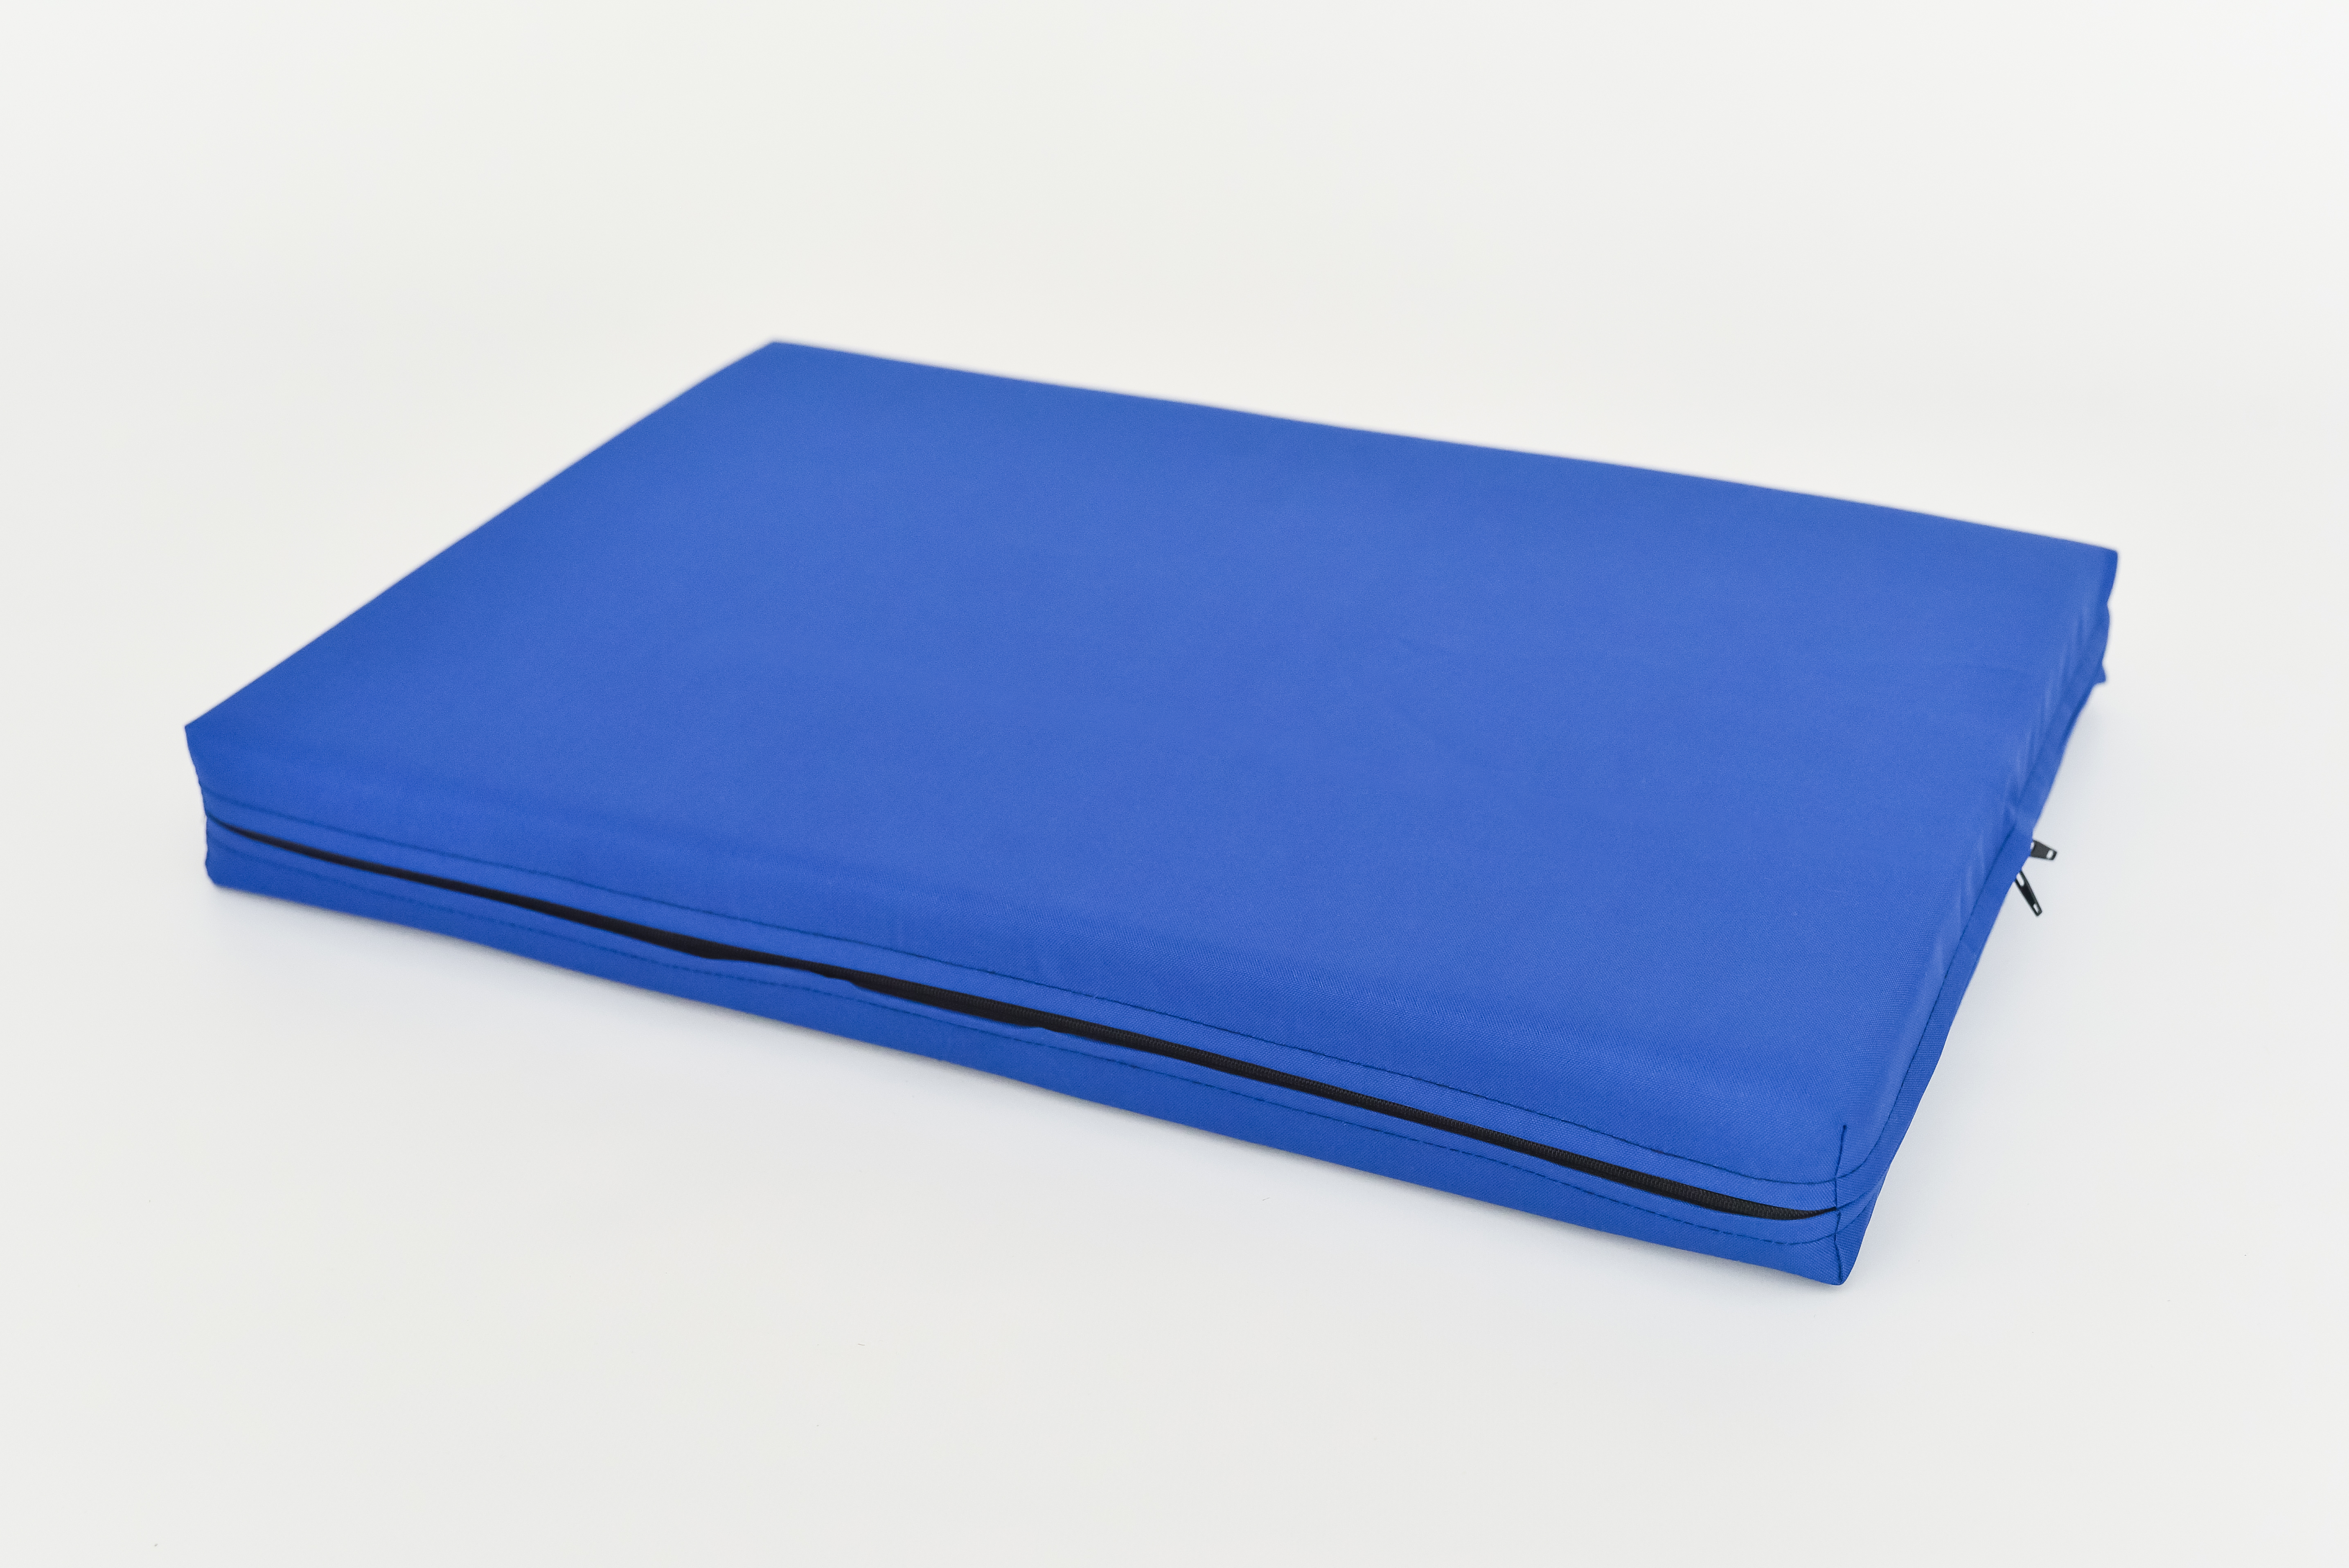 Saltea pentru antrenament la sol, Blue, 200x100x7cm